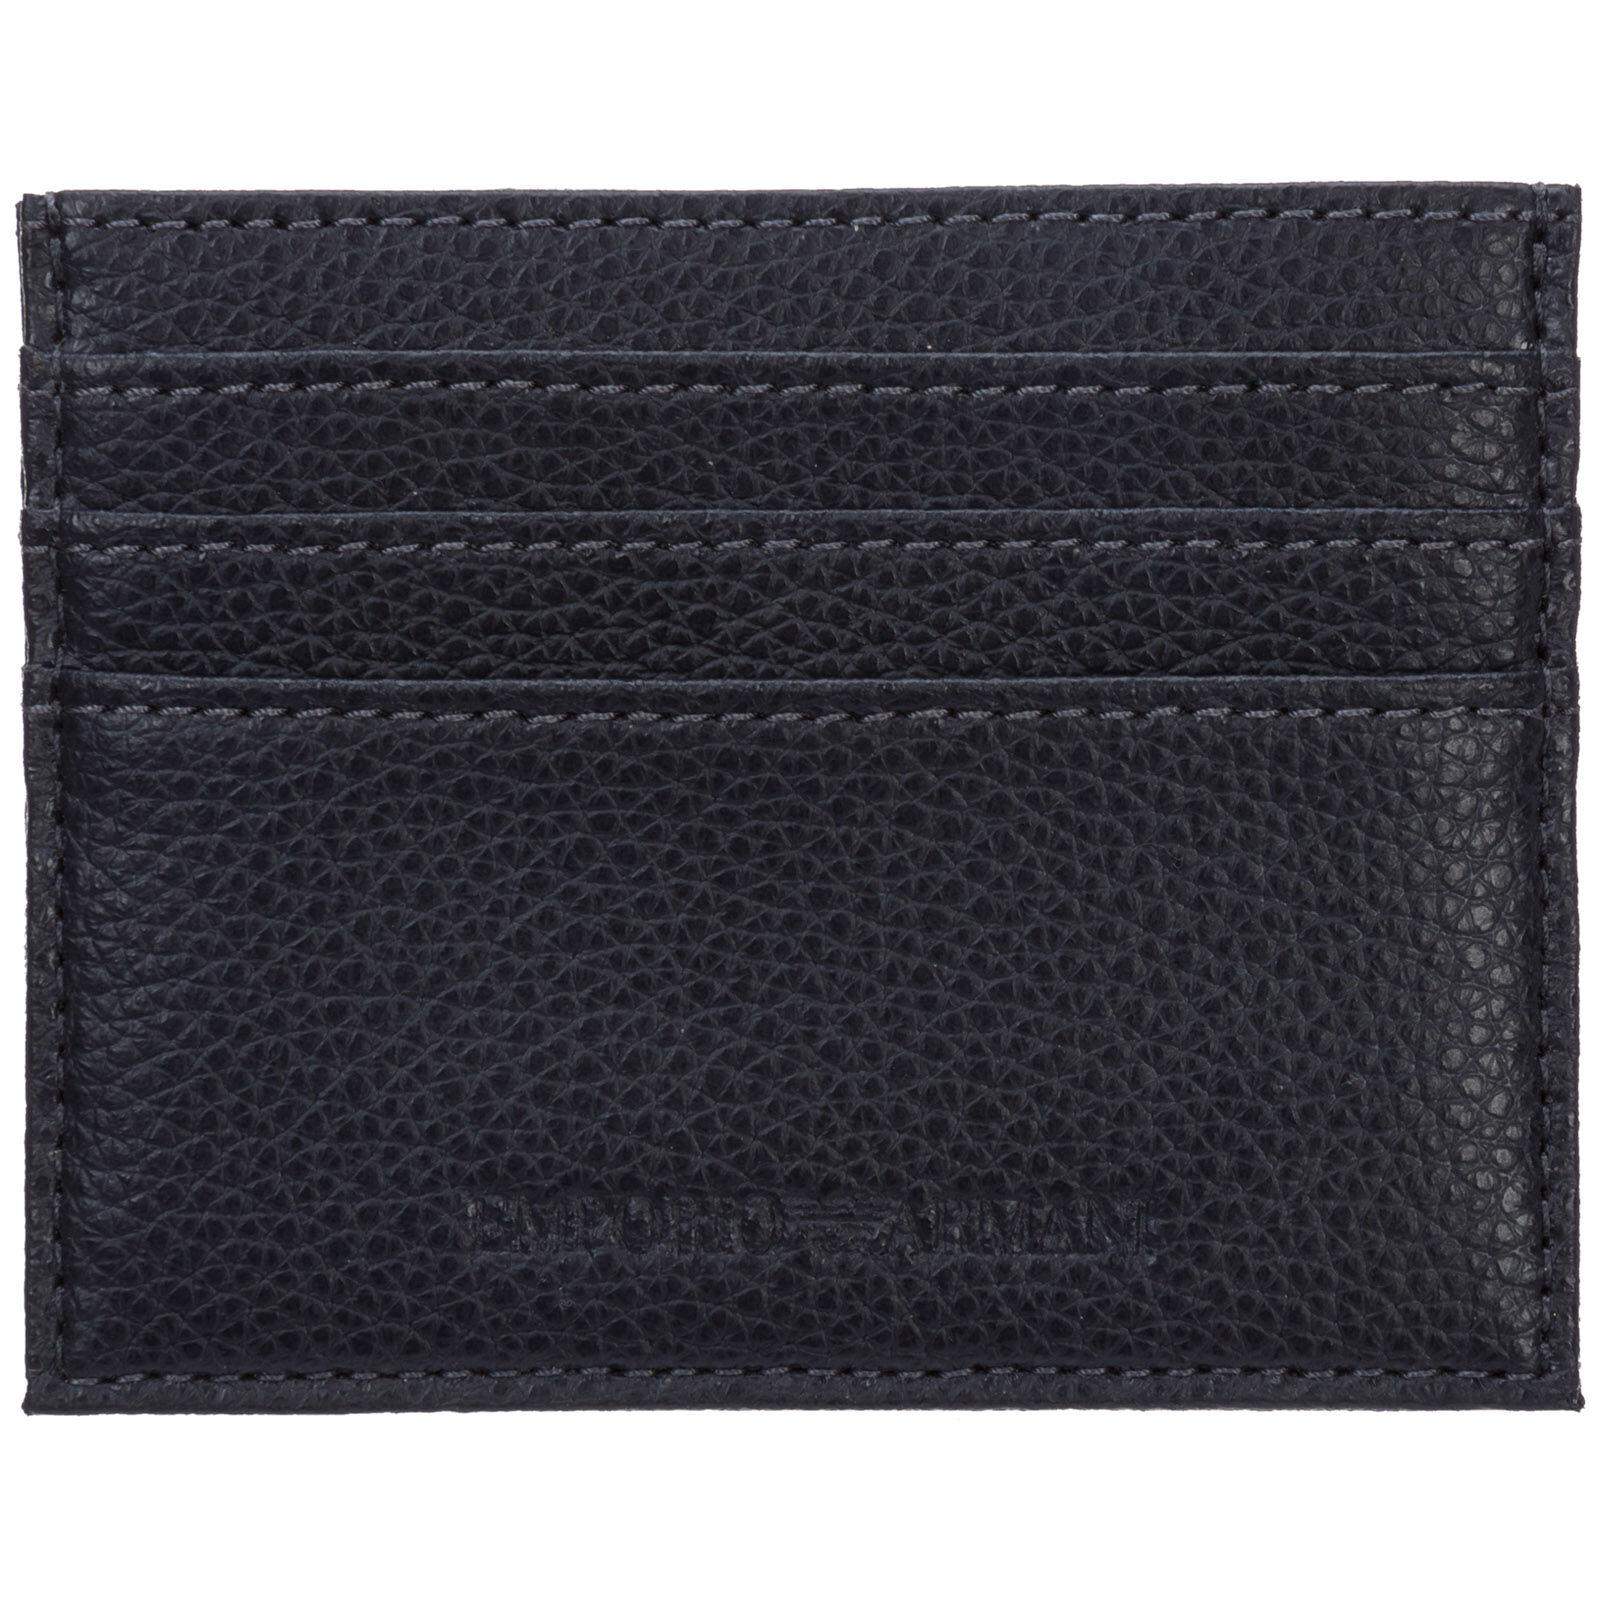 Emporio Armani Men's genuine leather credit card case holder wallet  - Blue